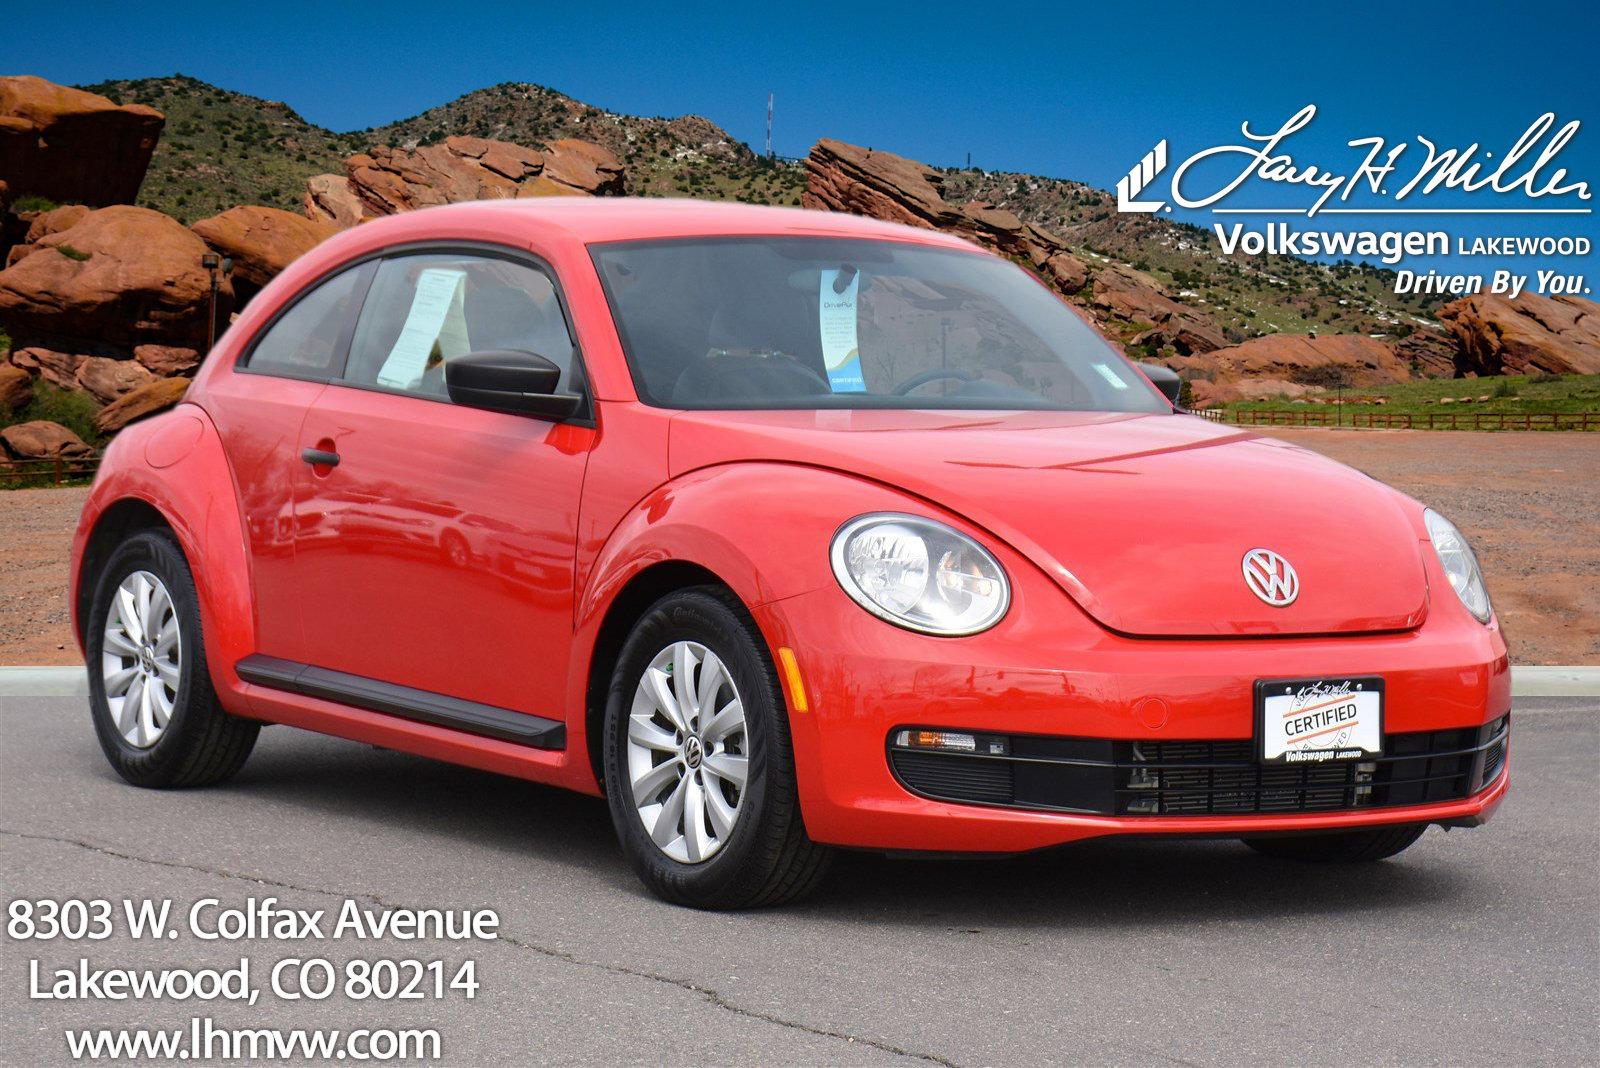 2015 Volkswagen Beetle 1.8T Coupe image